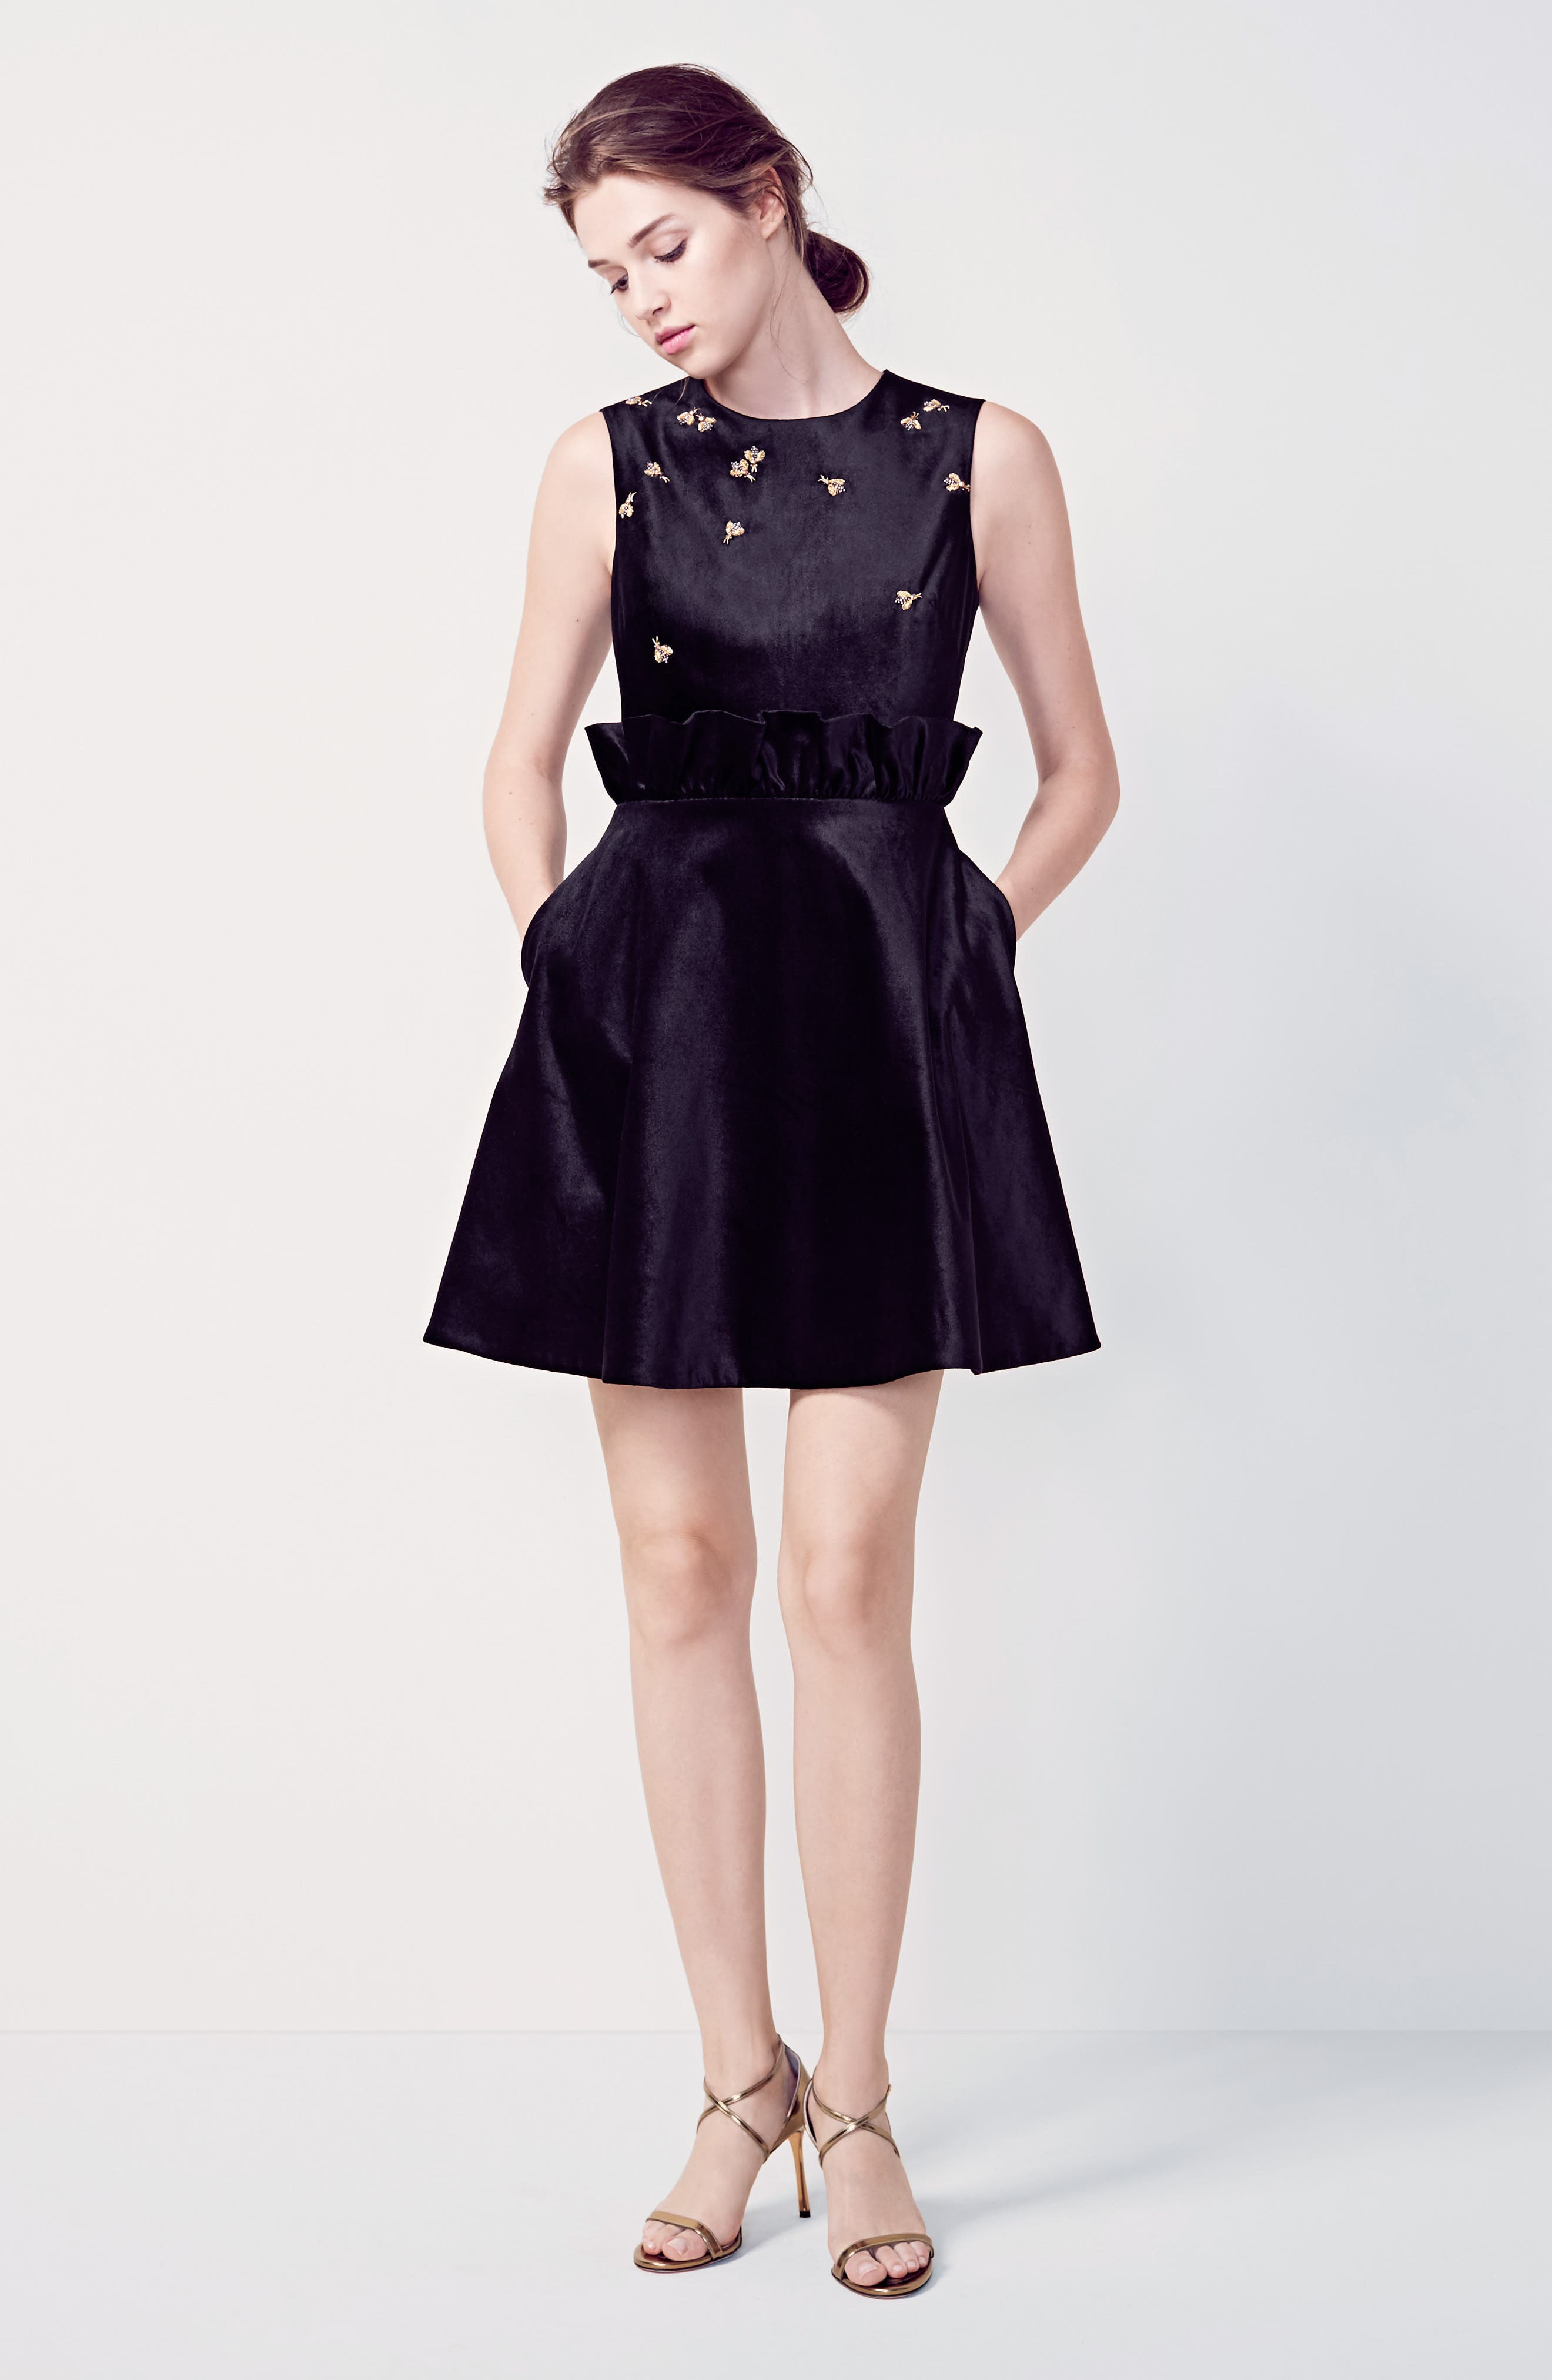 Dress lace dress long dress black dress sequins lace blue dress - Dress Lace Dress Long Dress Black Dress Sequins Lace Blue Dress 7